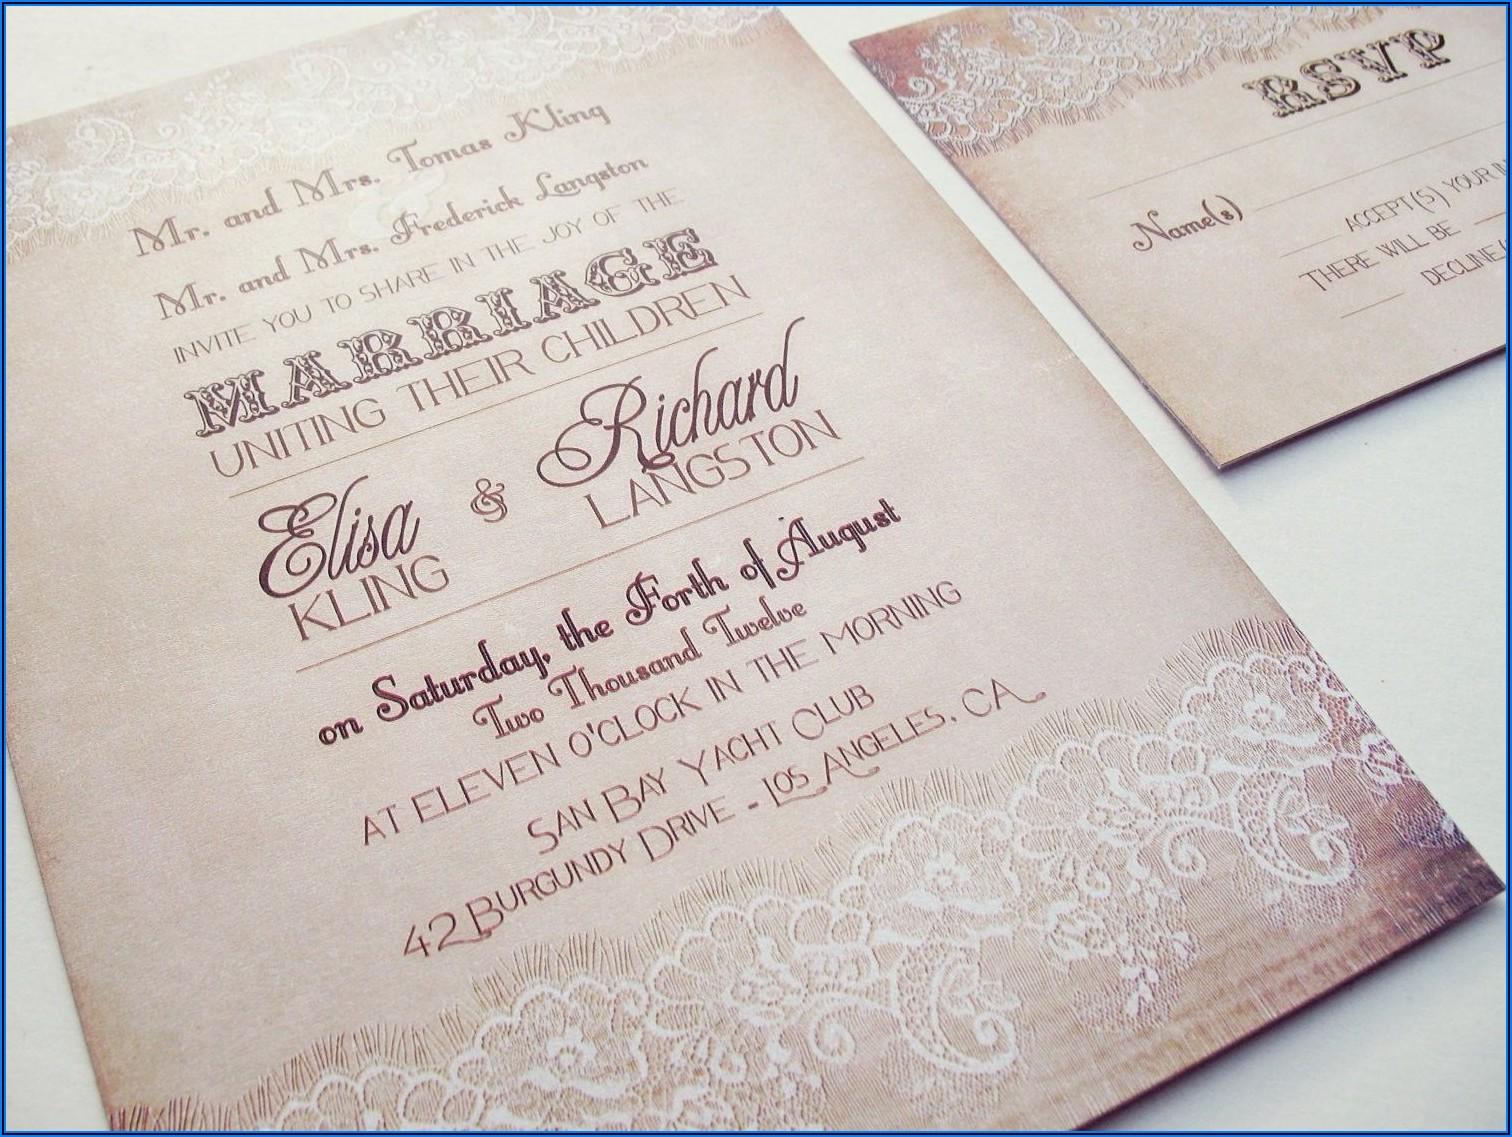 Staples Canada Printing Wedding Invitations